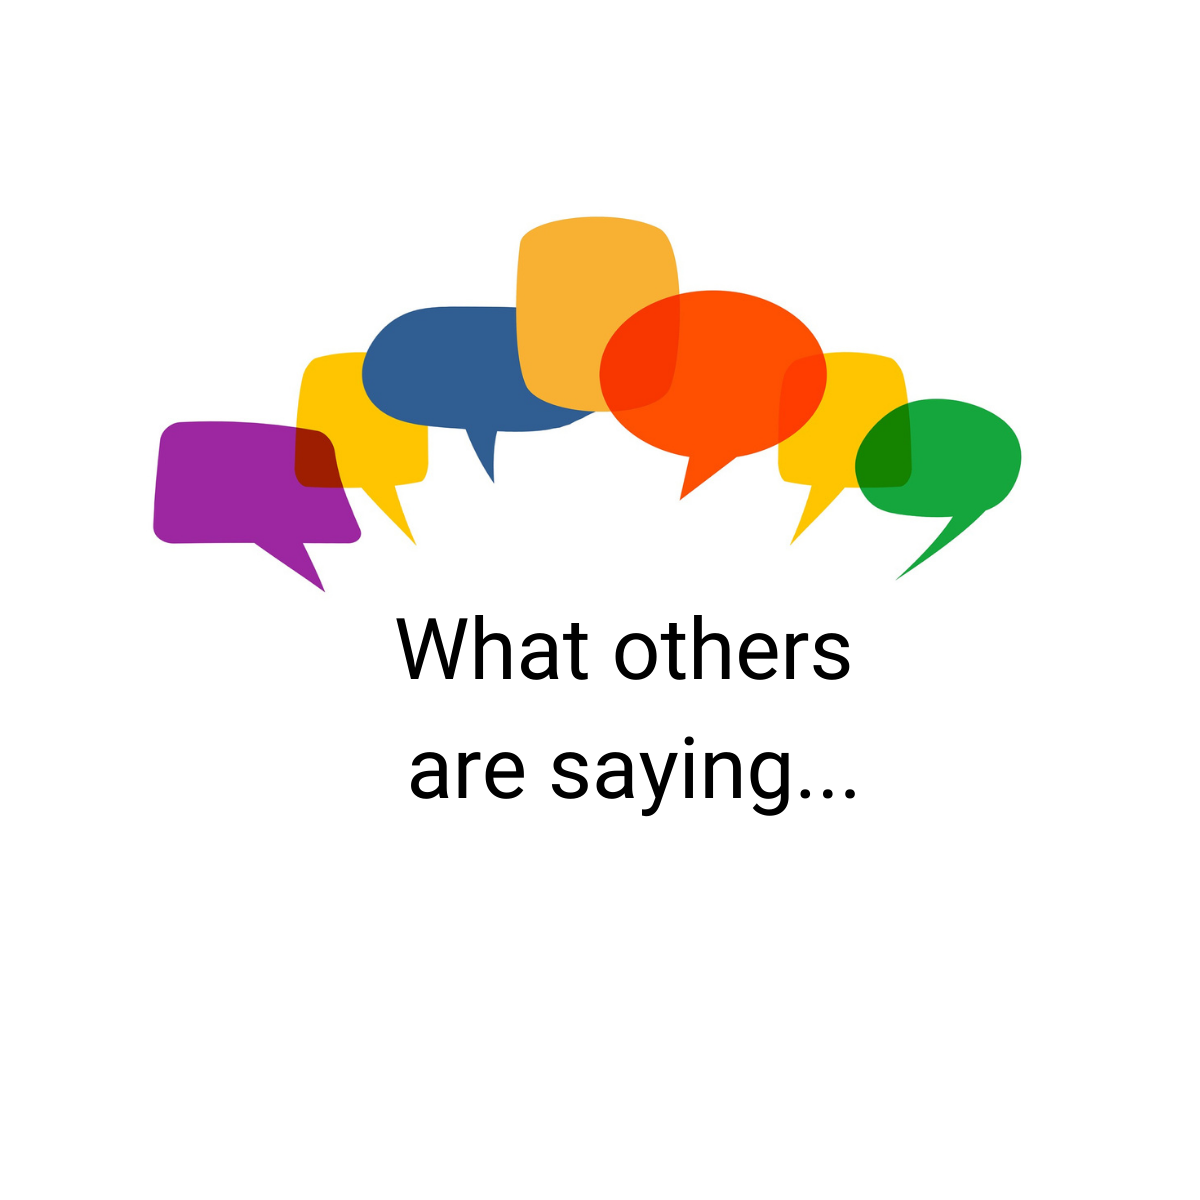 Customer reviews and testimonials